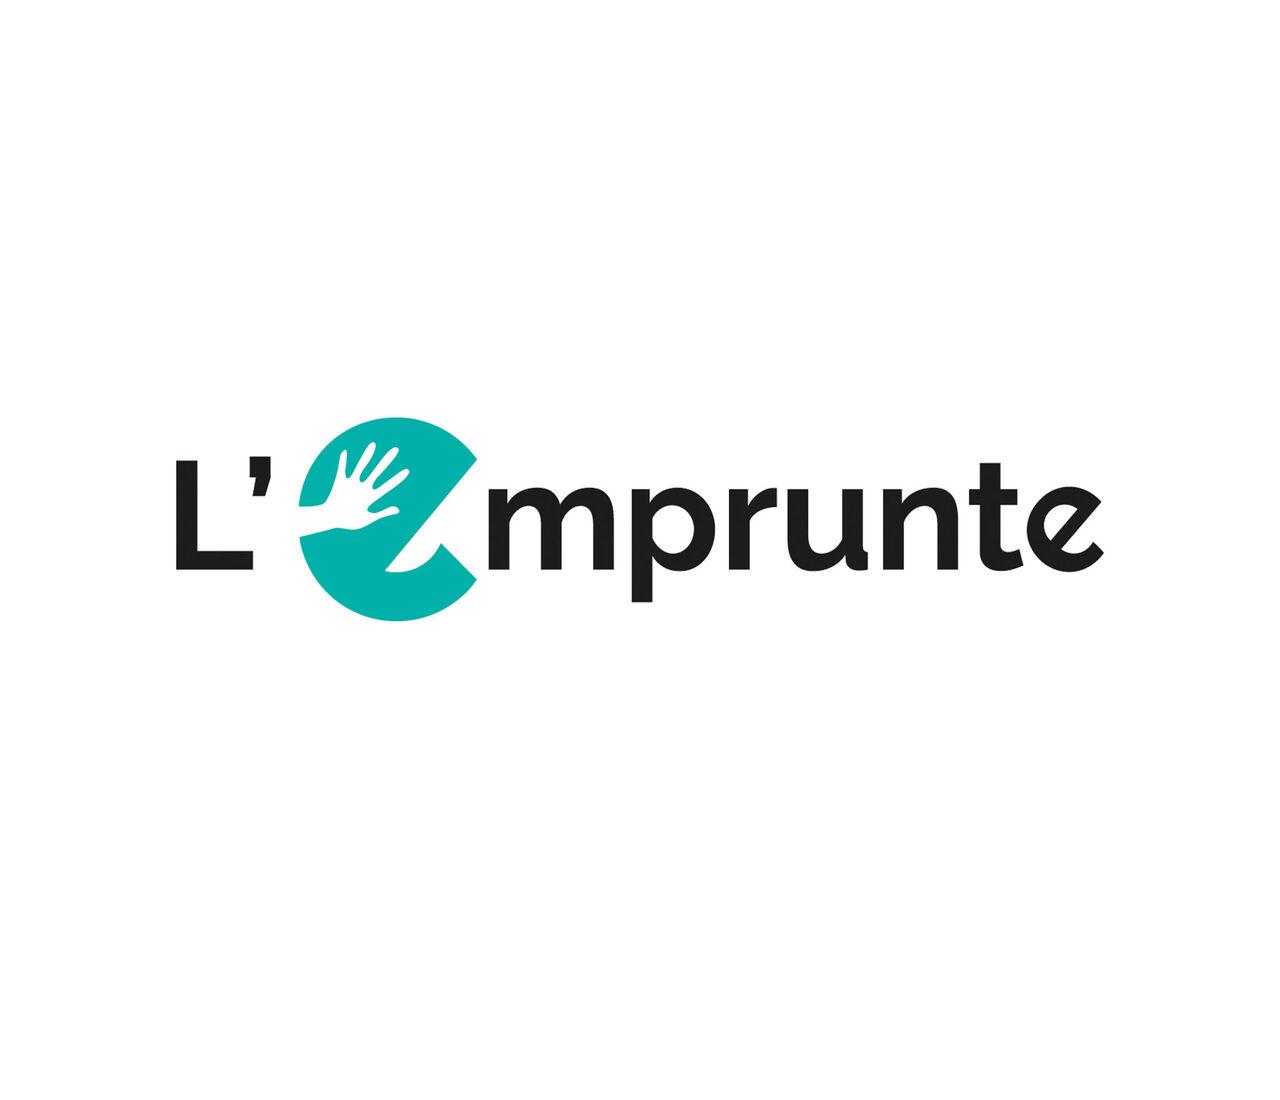 Logo L'Emprunte